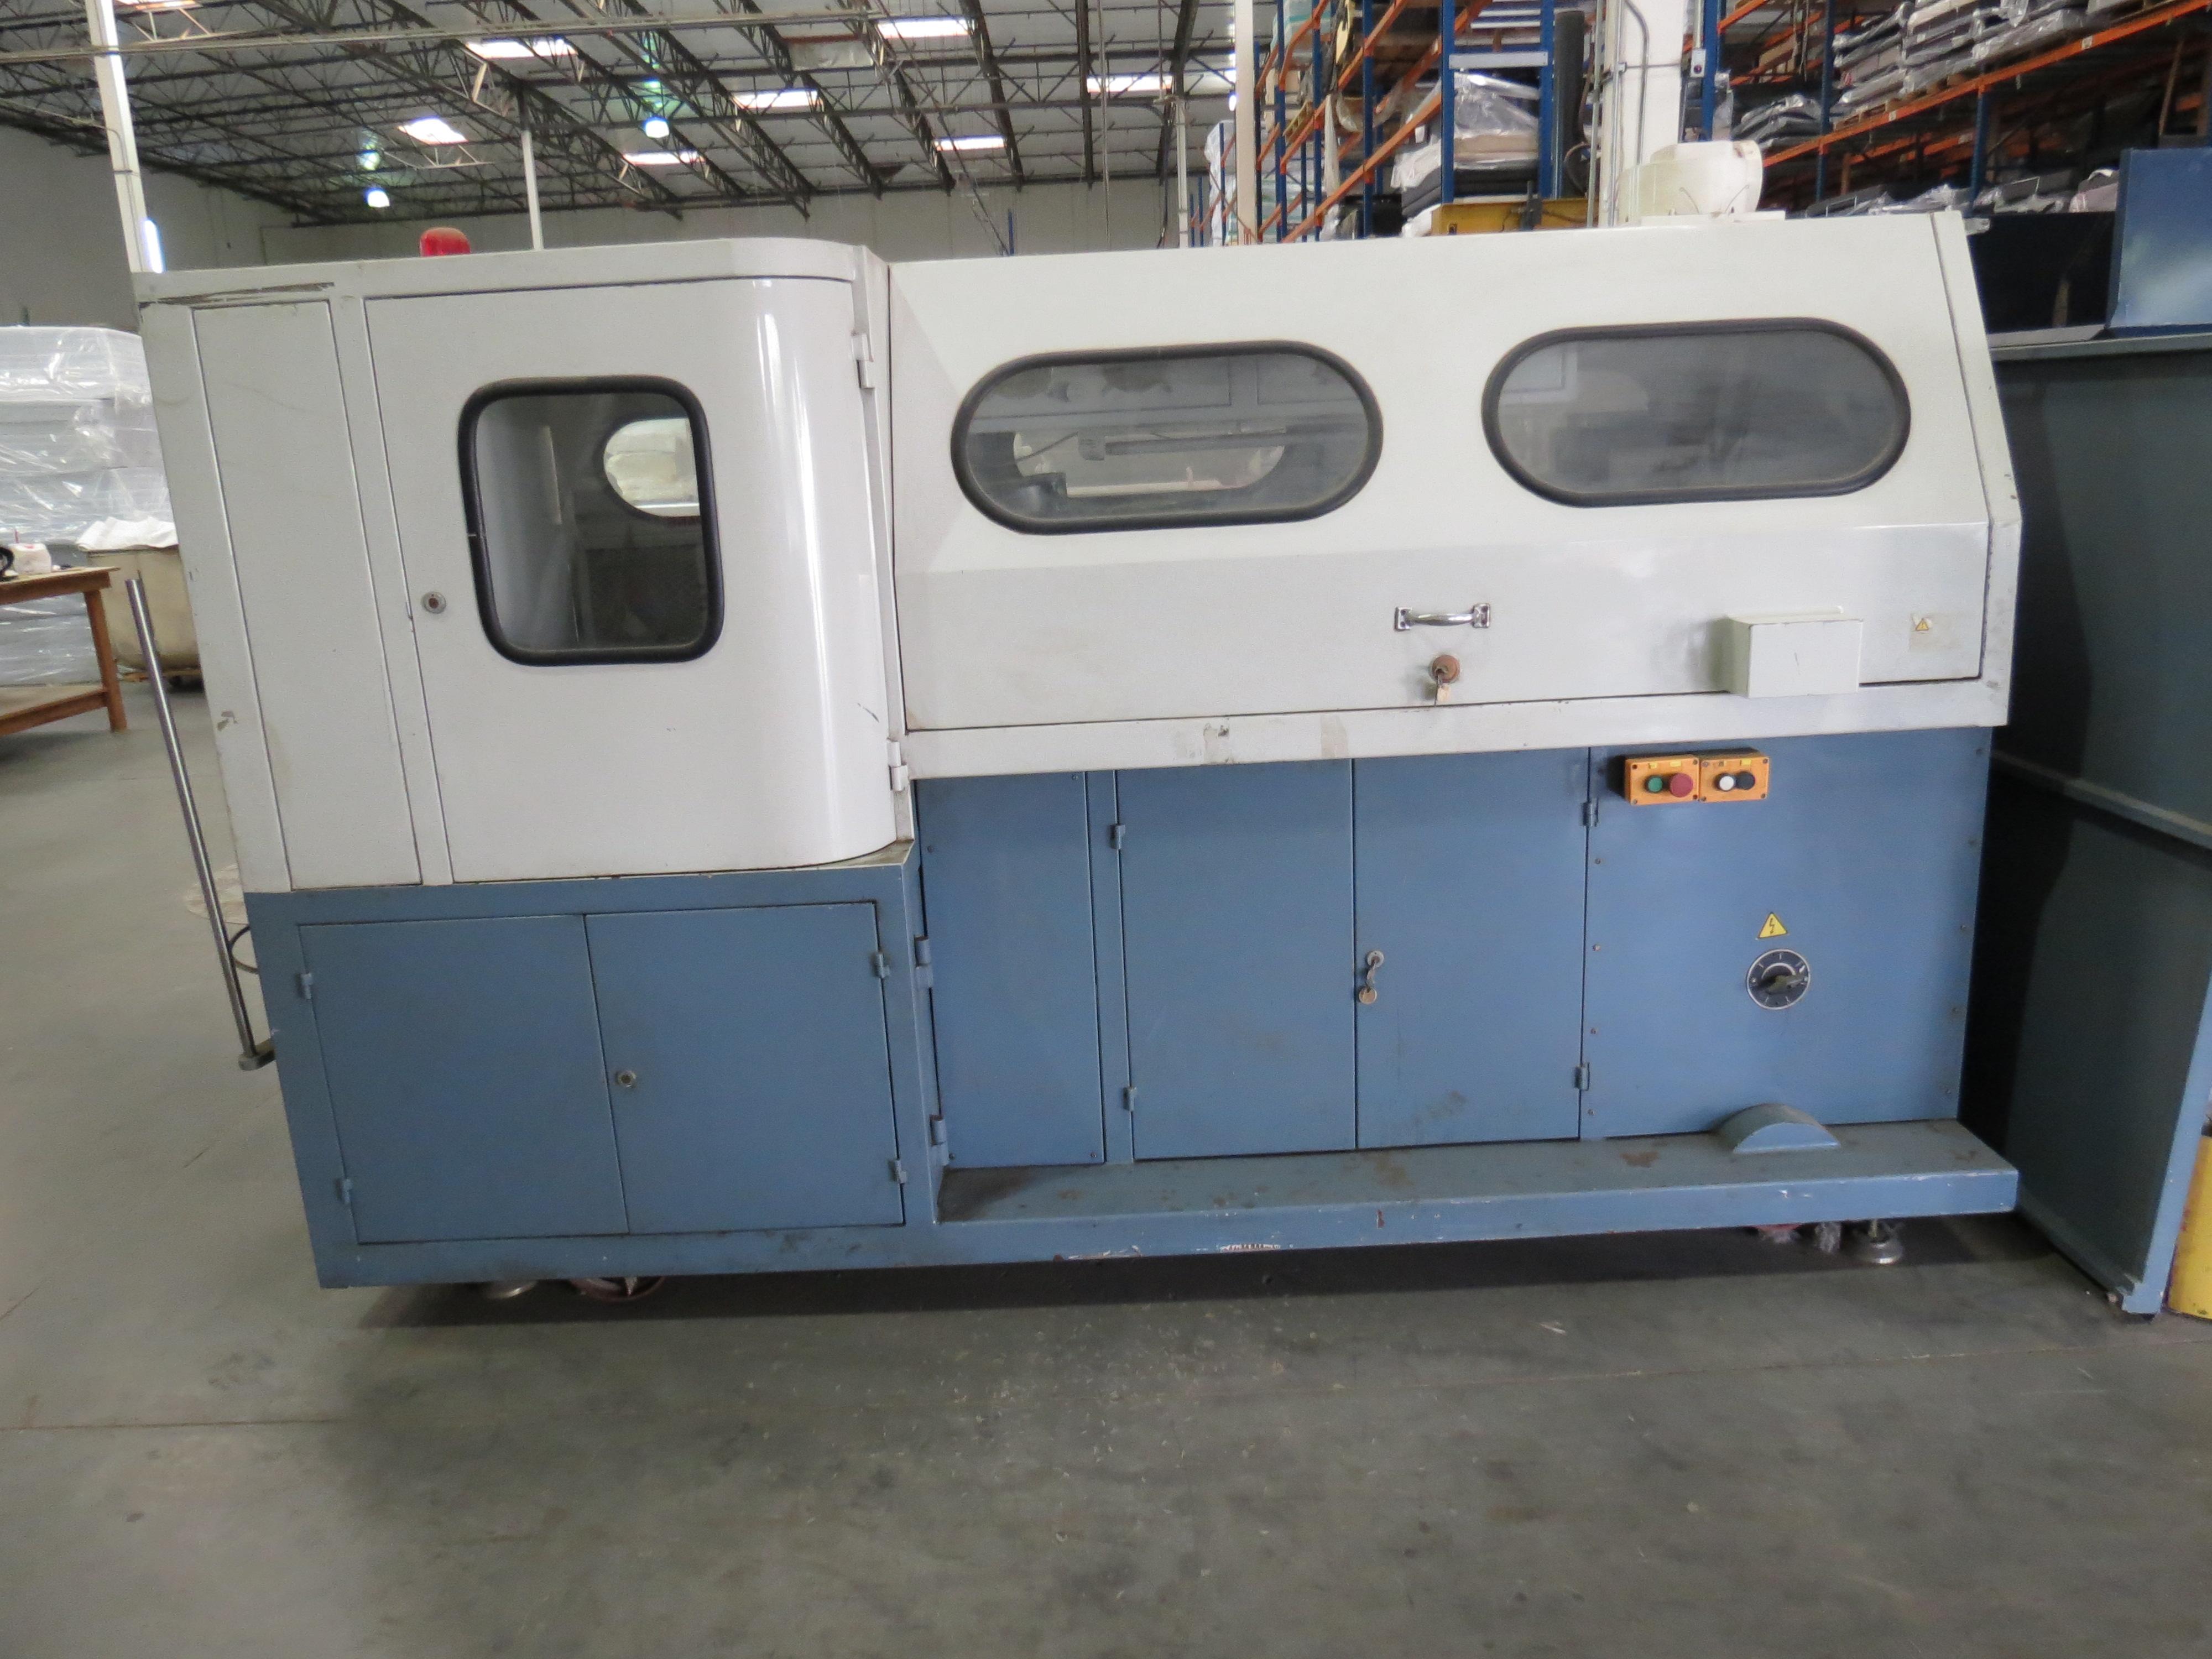 Foshan Yuatian Mattress Machine DZ-6AAutomatic Pocket Spring Machine, 220V, SN:0905005022 - Image 3 of 5